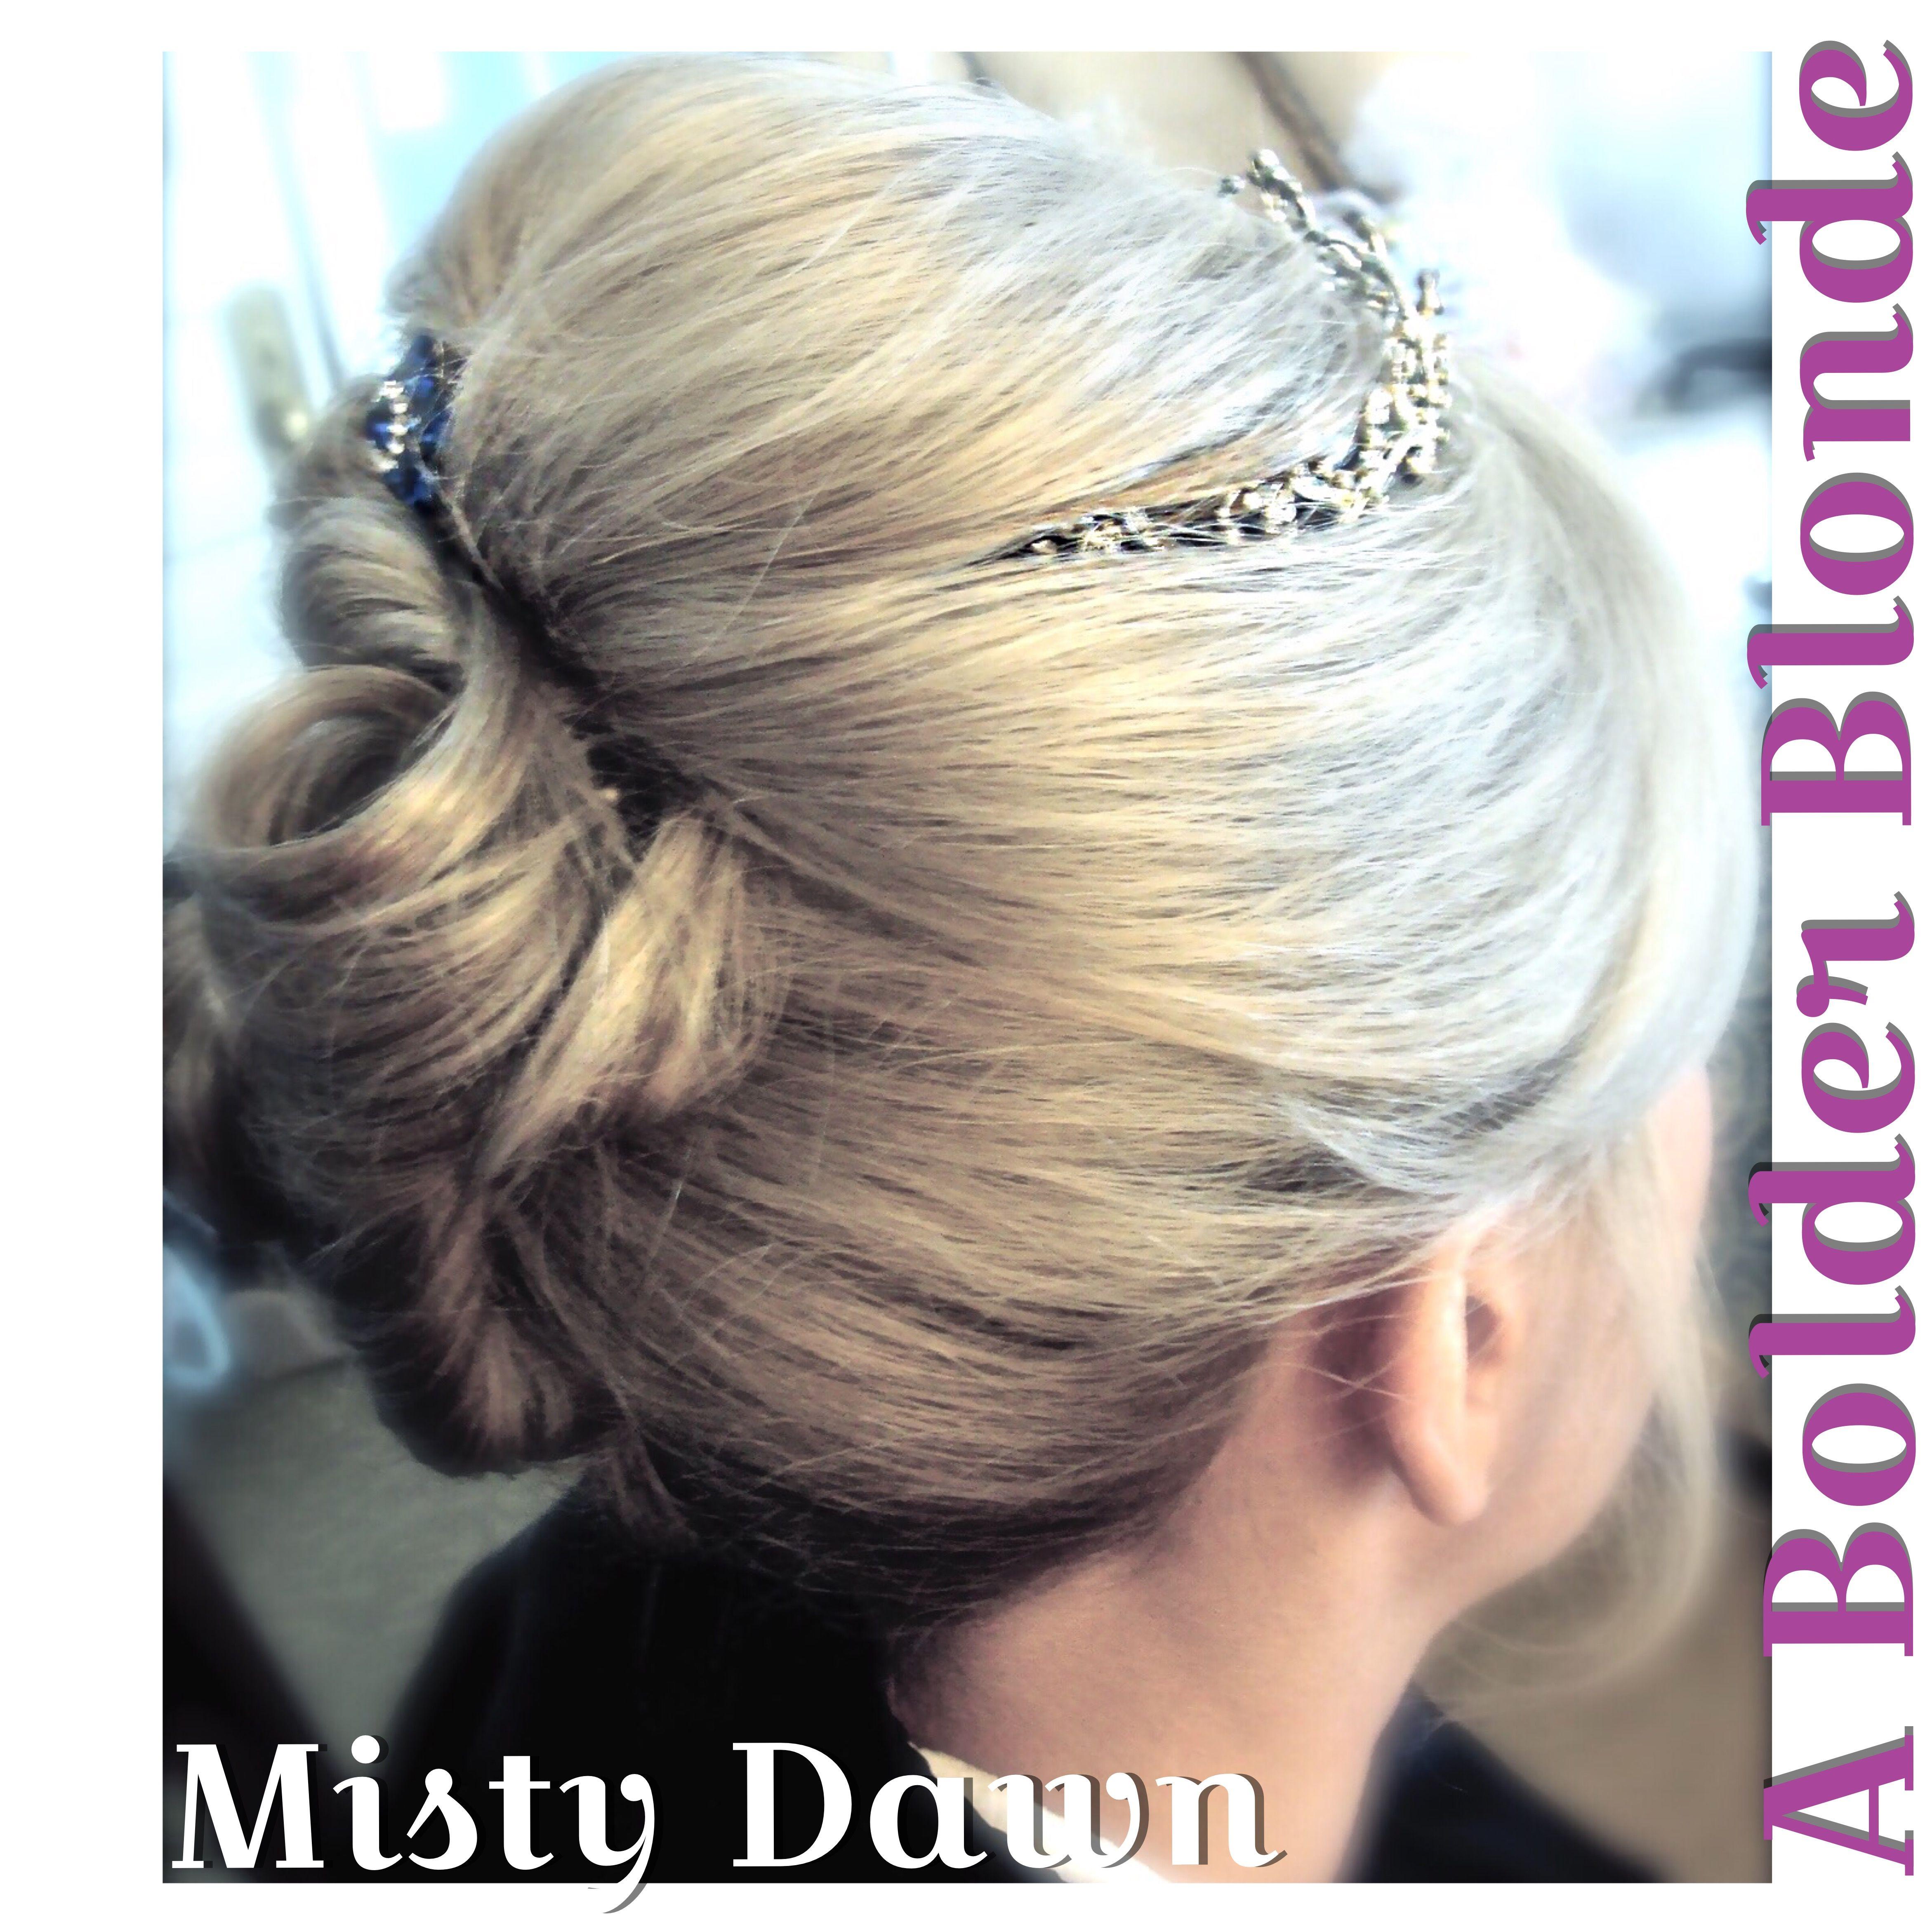 ABolderBlonde MistyDawn Bride BridalUpdo WeddingHair Colorado